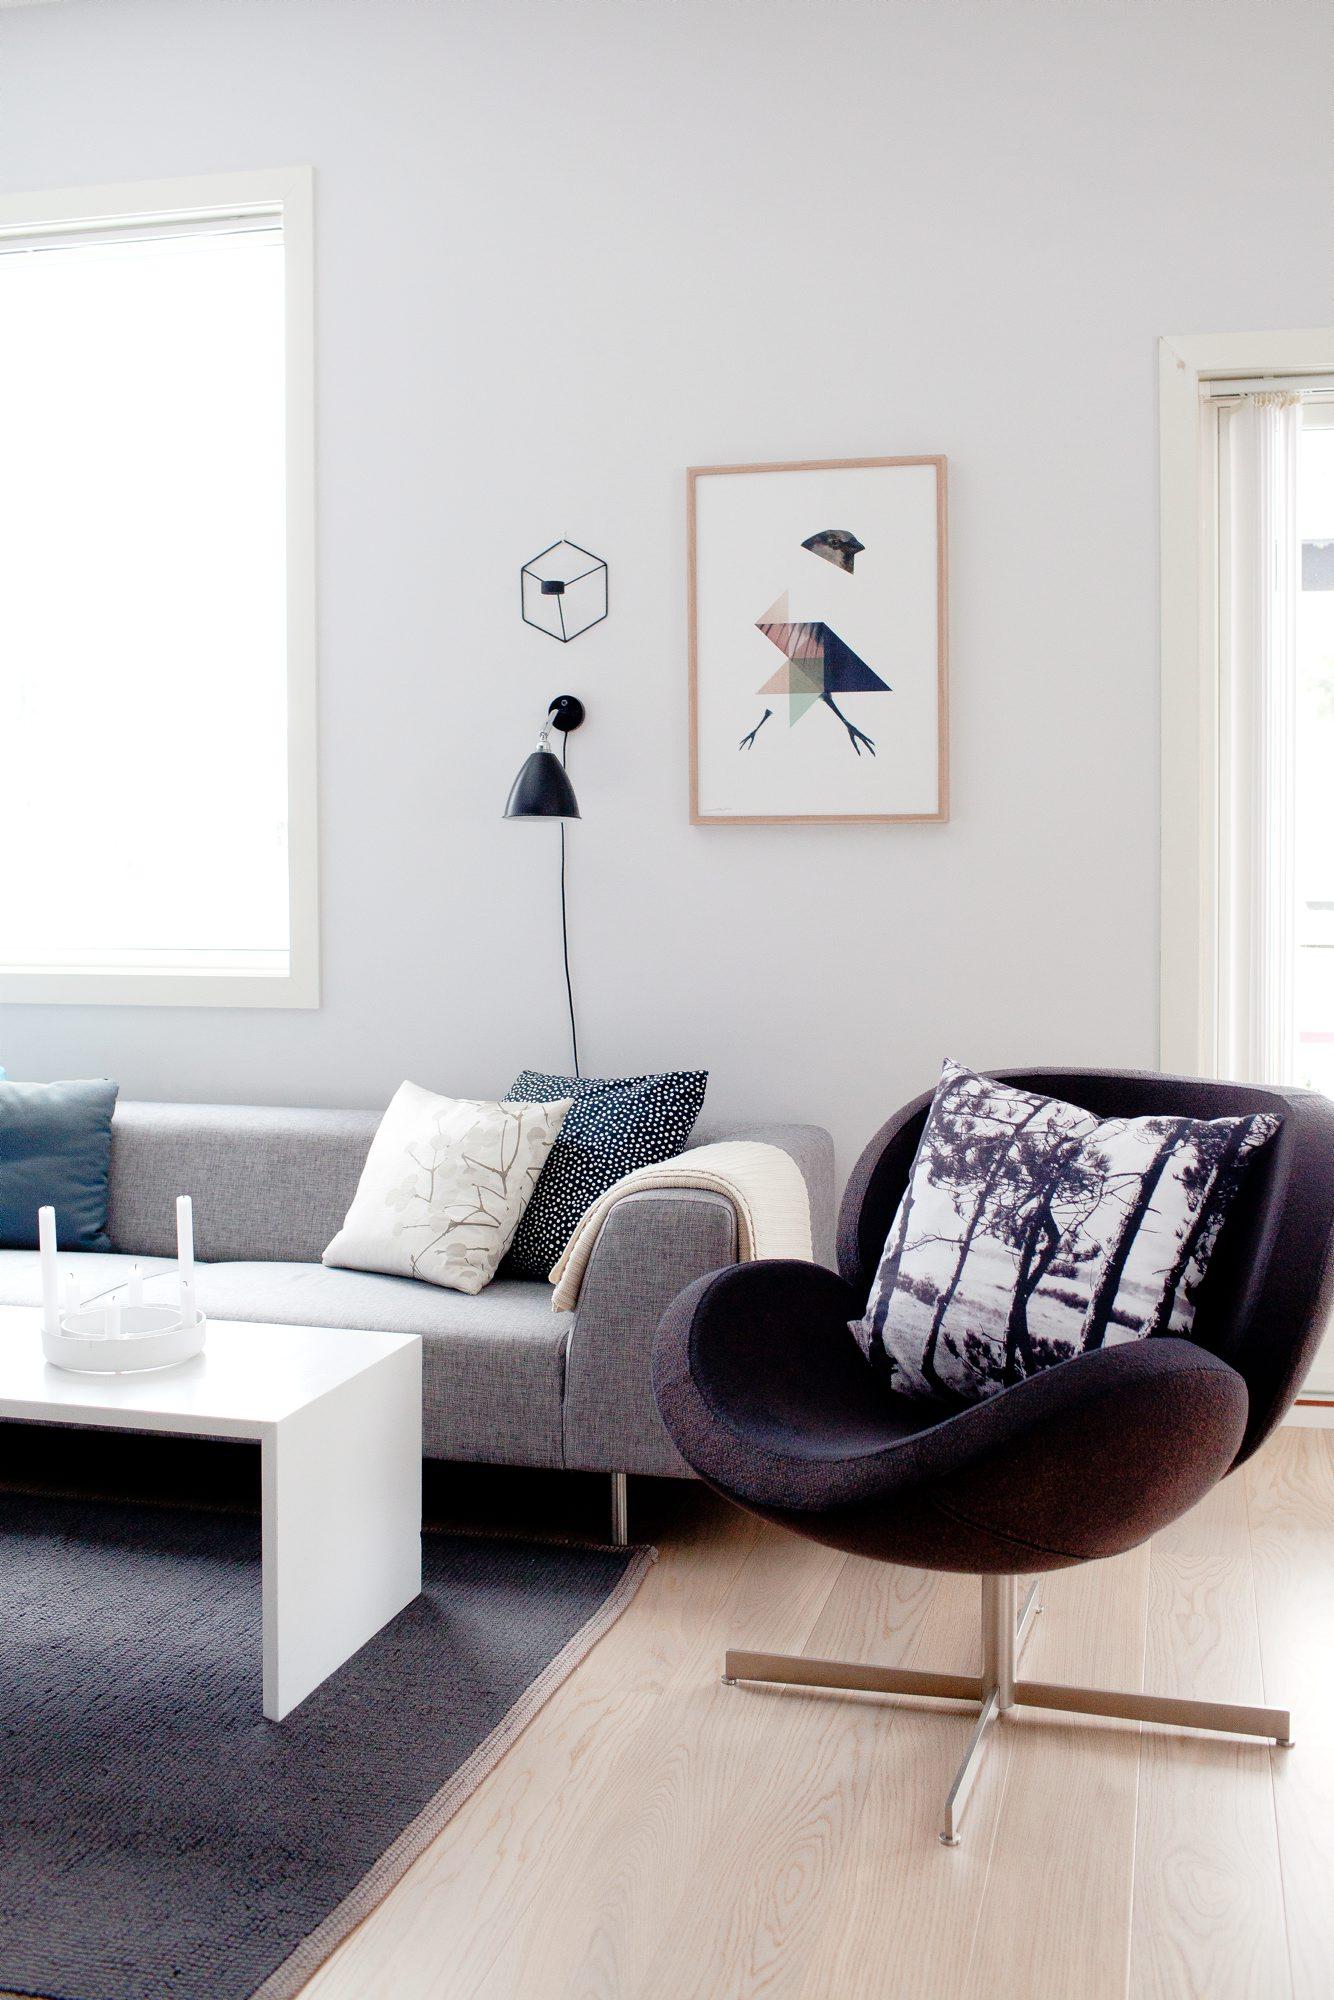 carina jokernord boligportrett stue